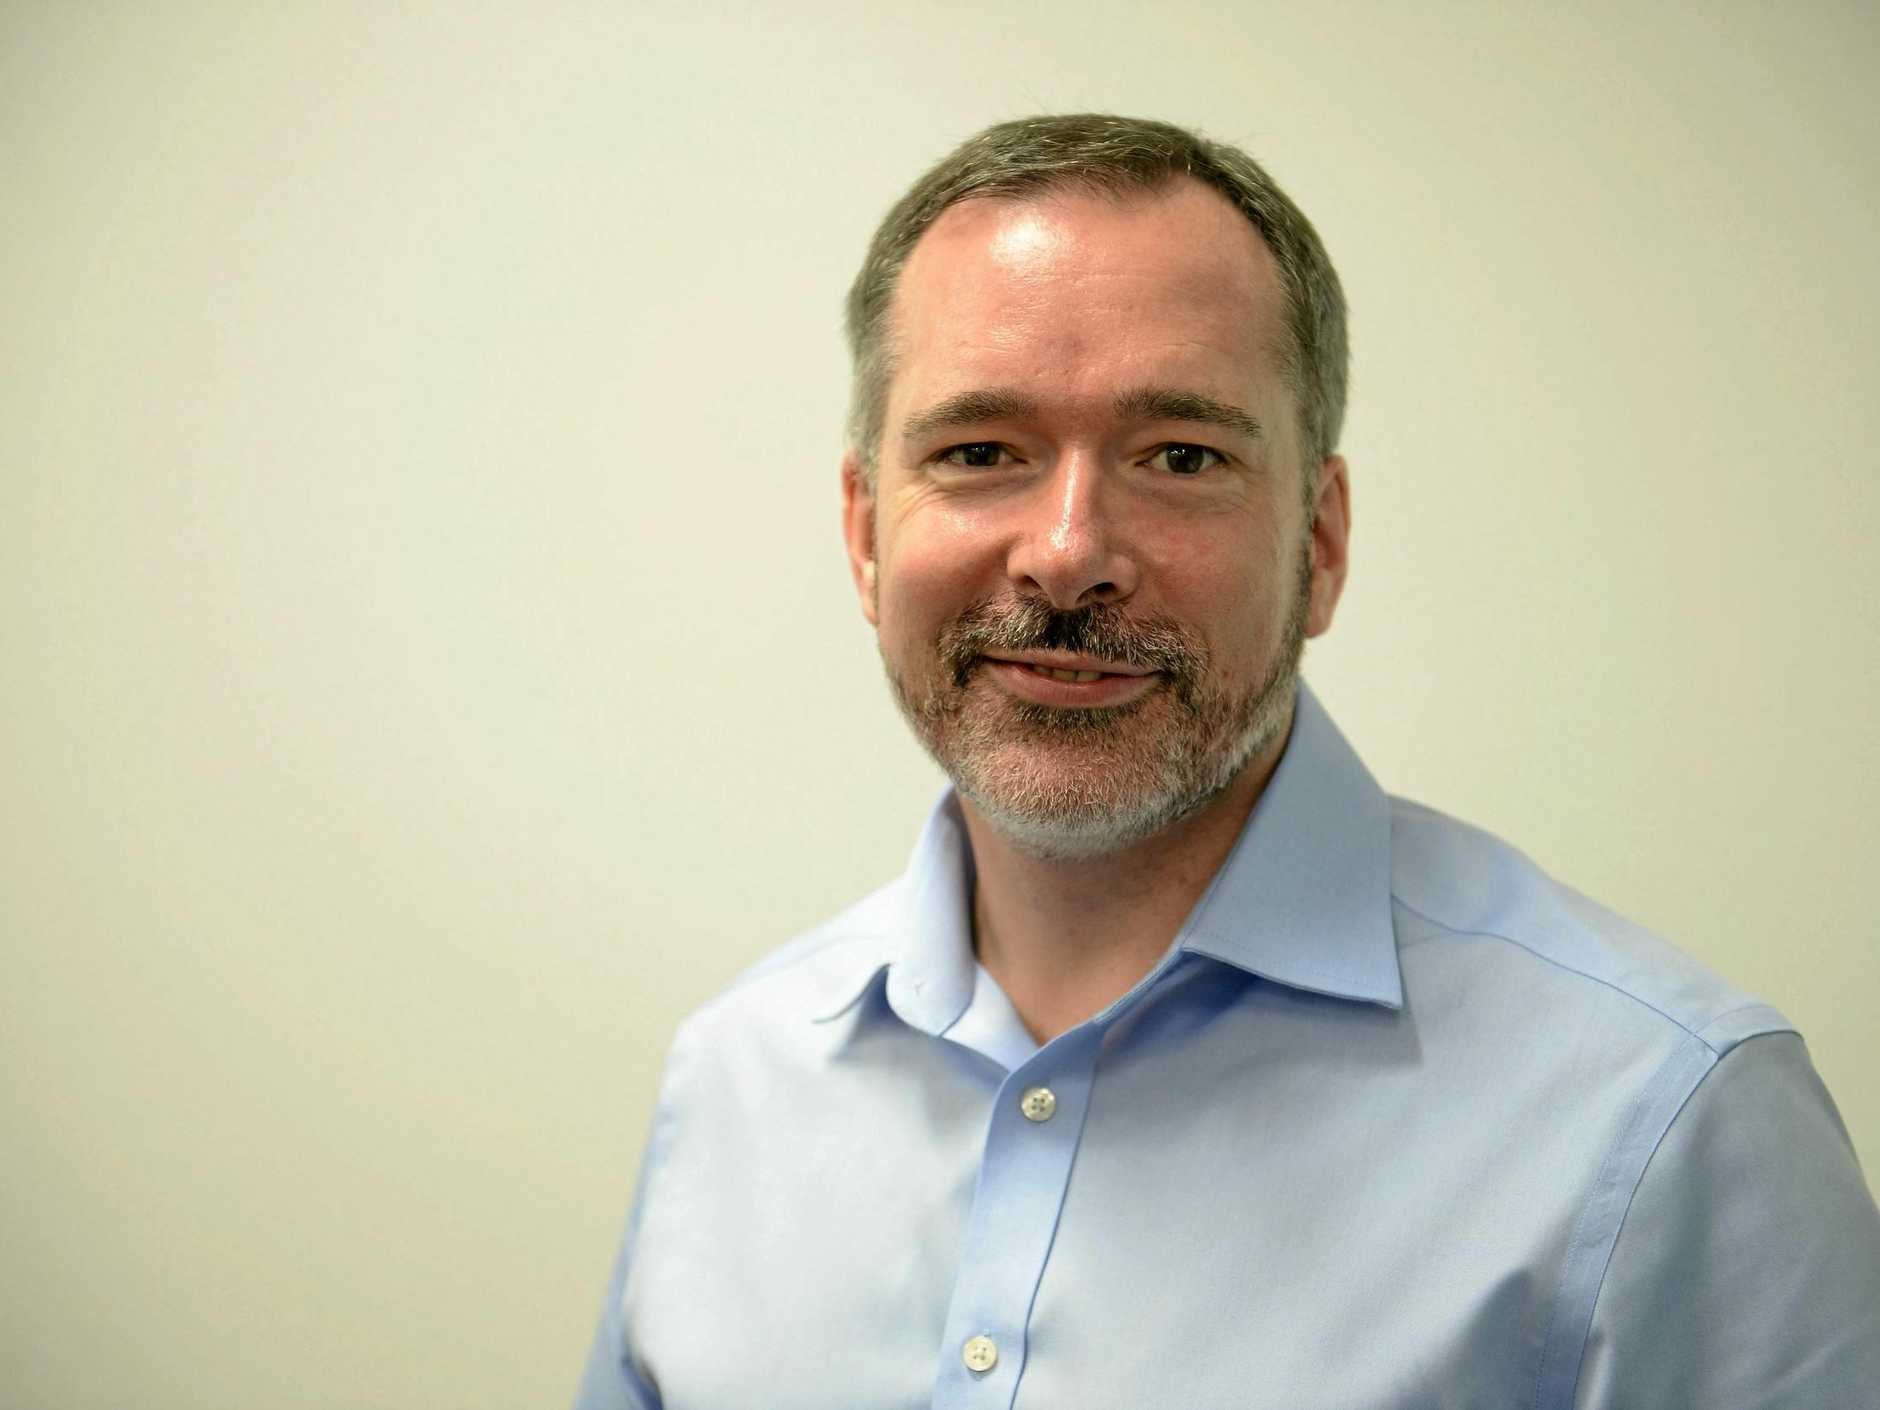 CQHHS chief executive Steve Williamson.